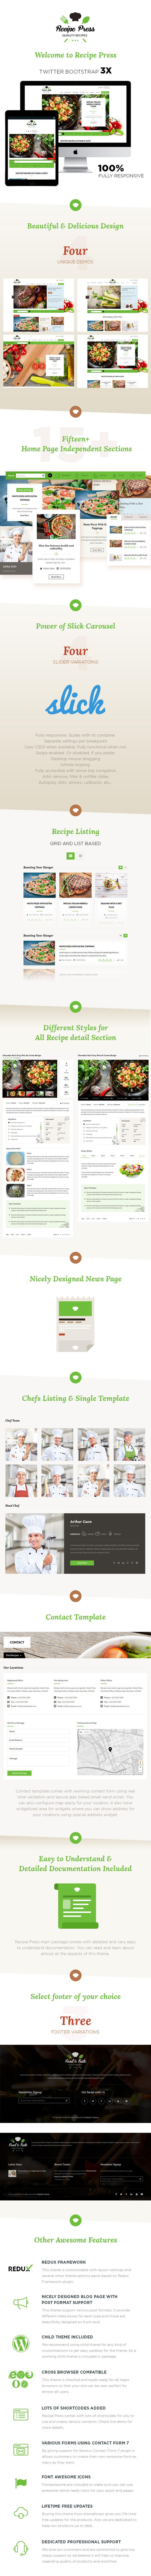 RecipePress - Food & Recipes Premium WordPress Theme